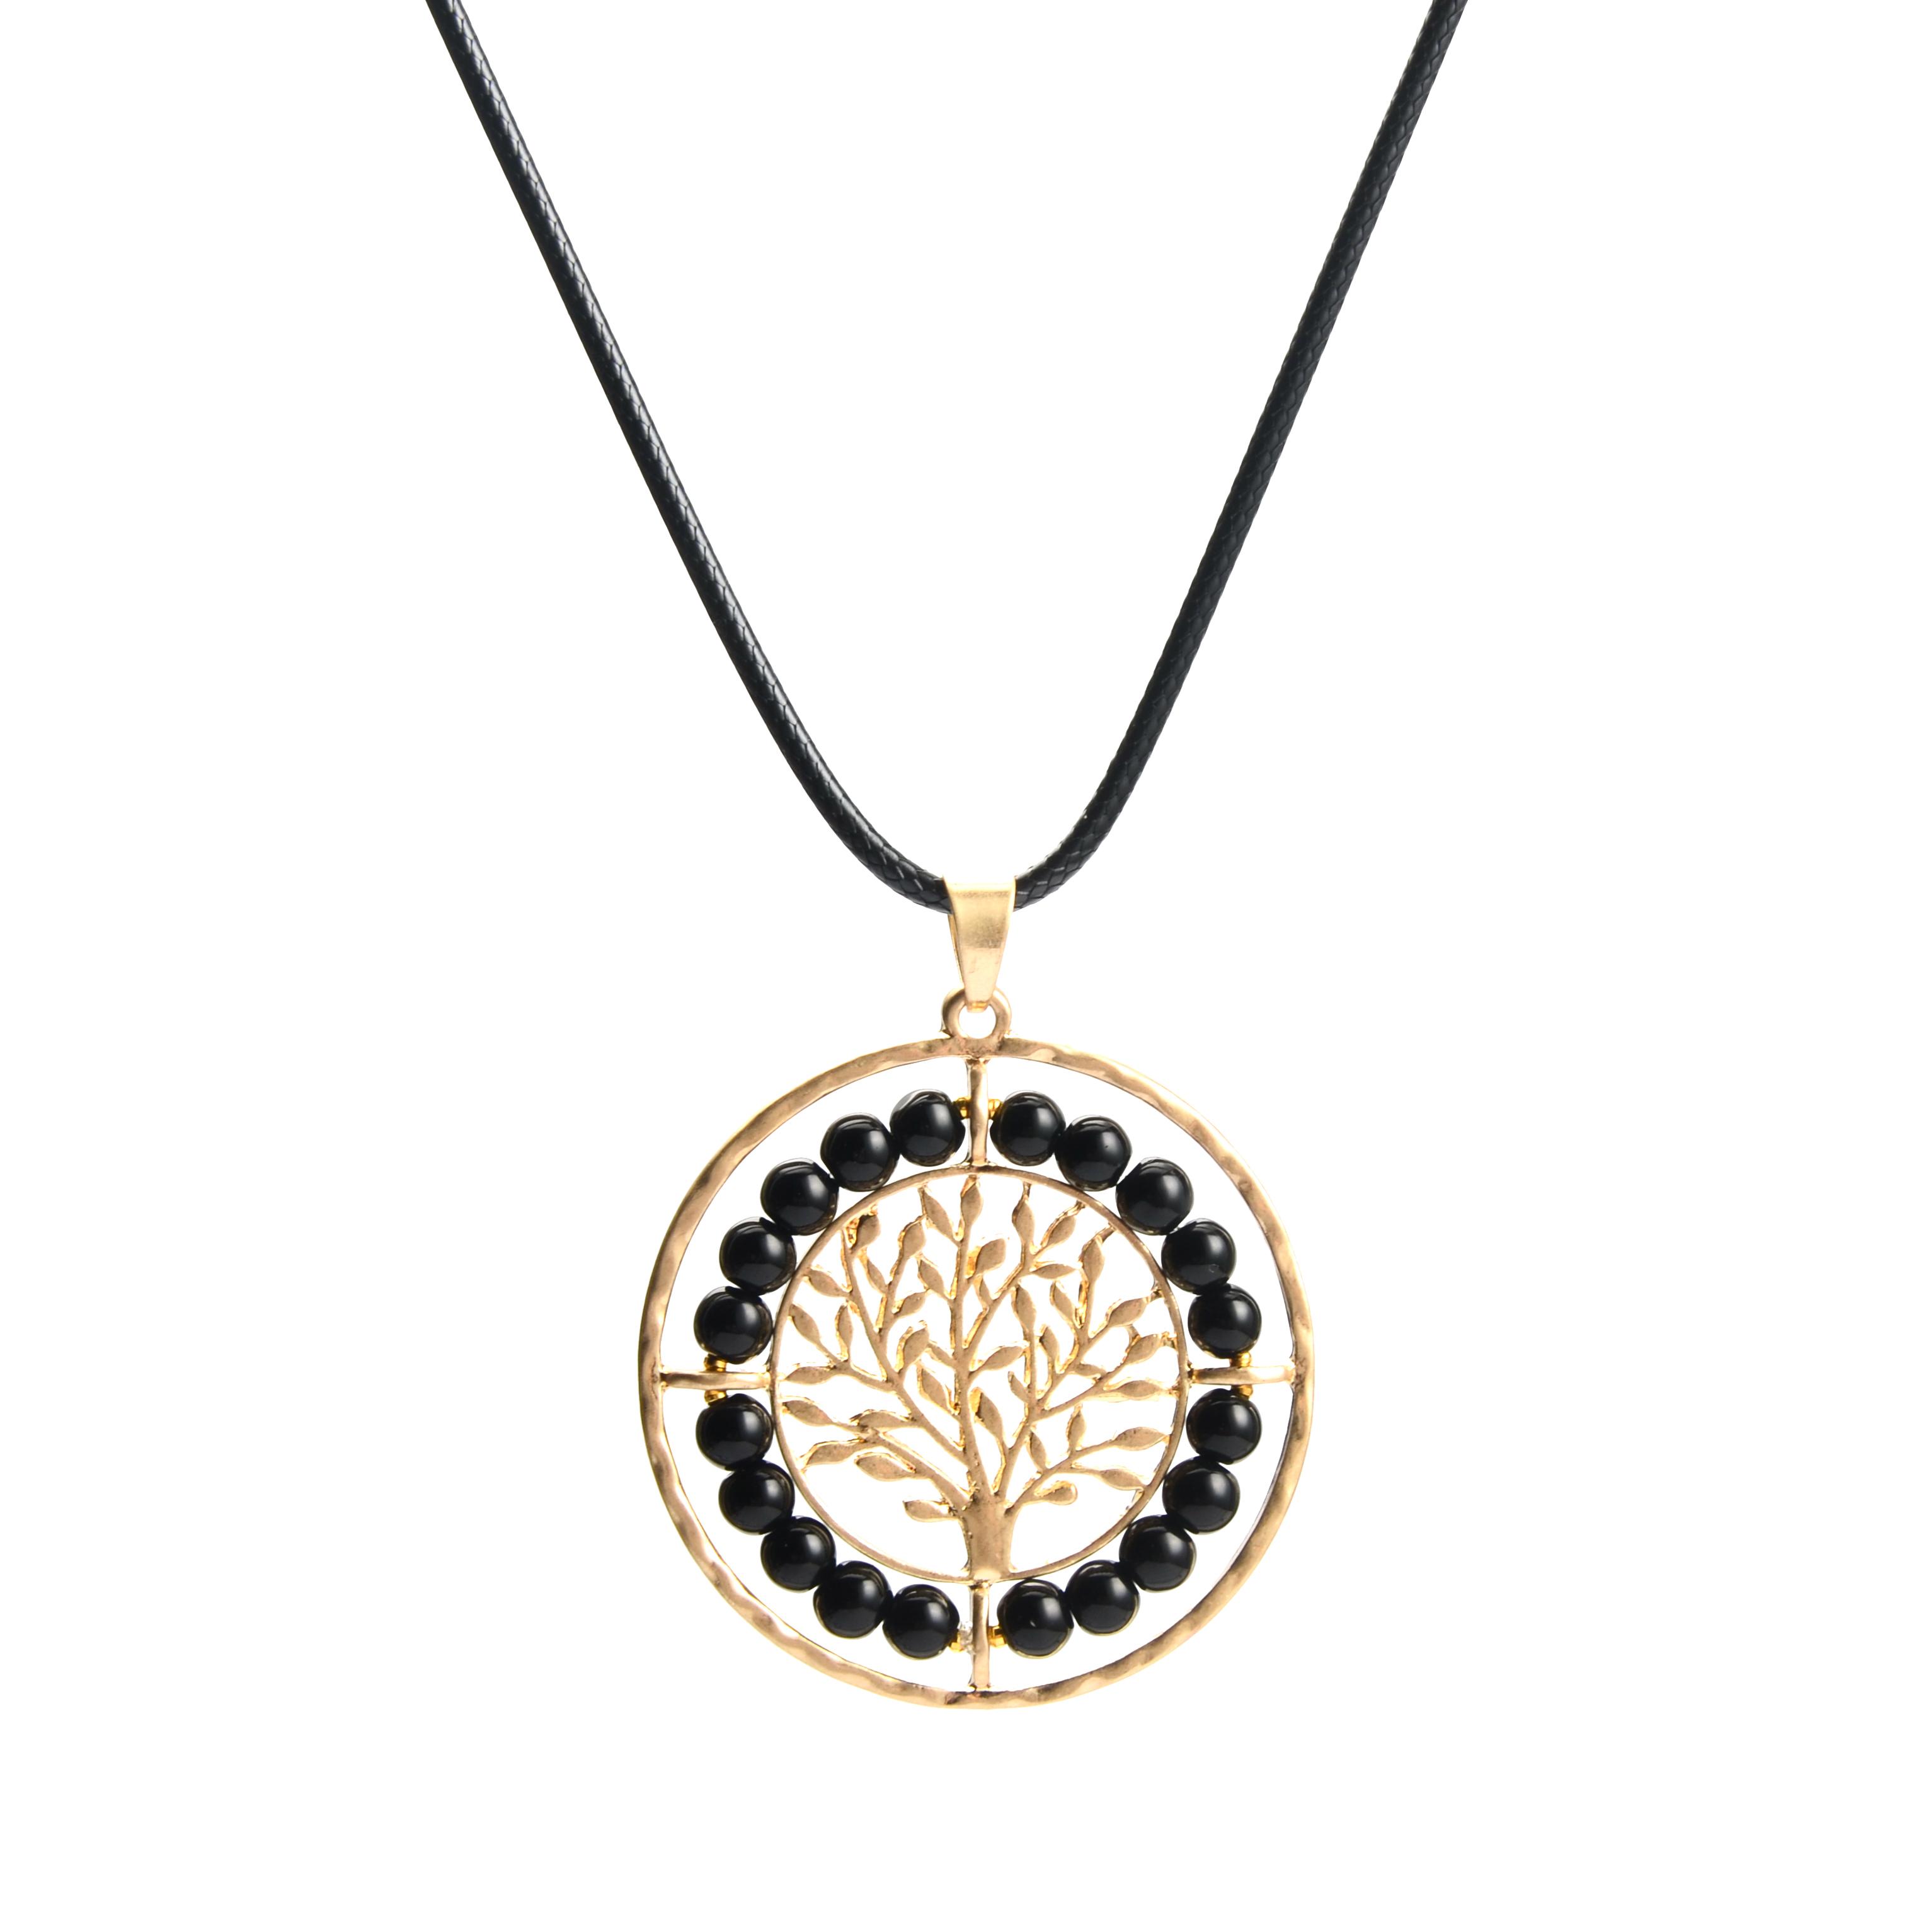 WENZHE handmade fashion custom tree of life beads hollow round pendant necklace Featured Image